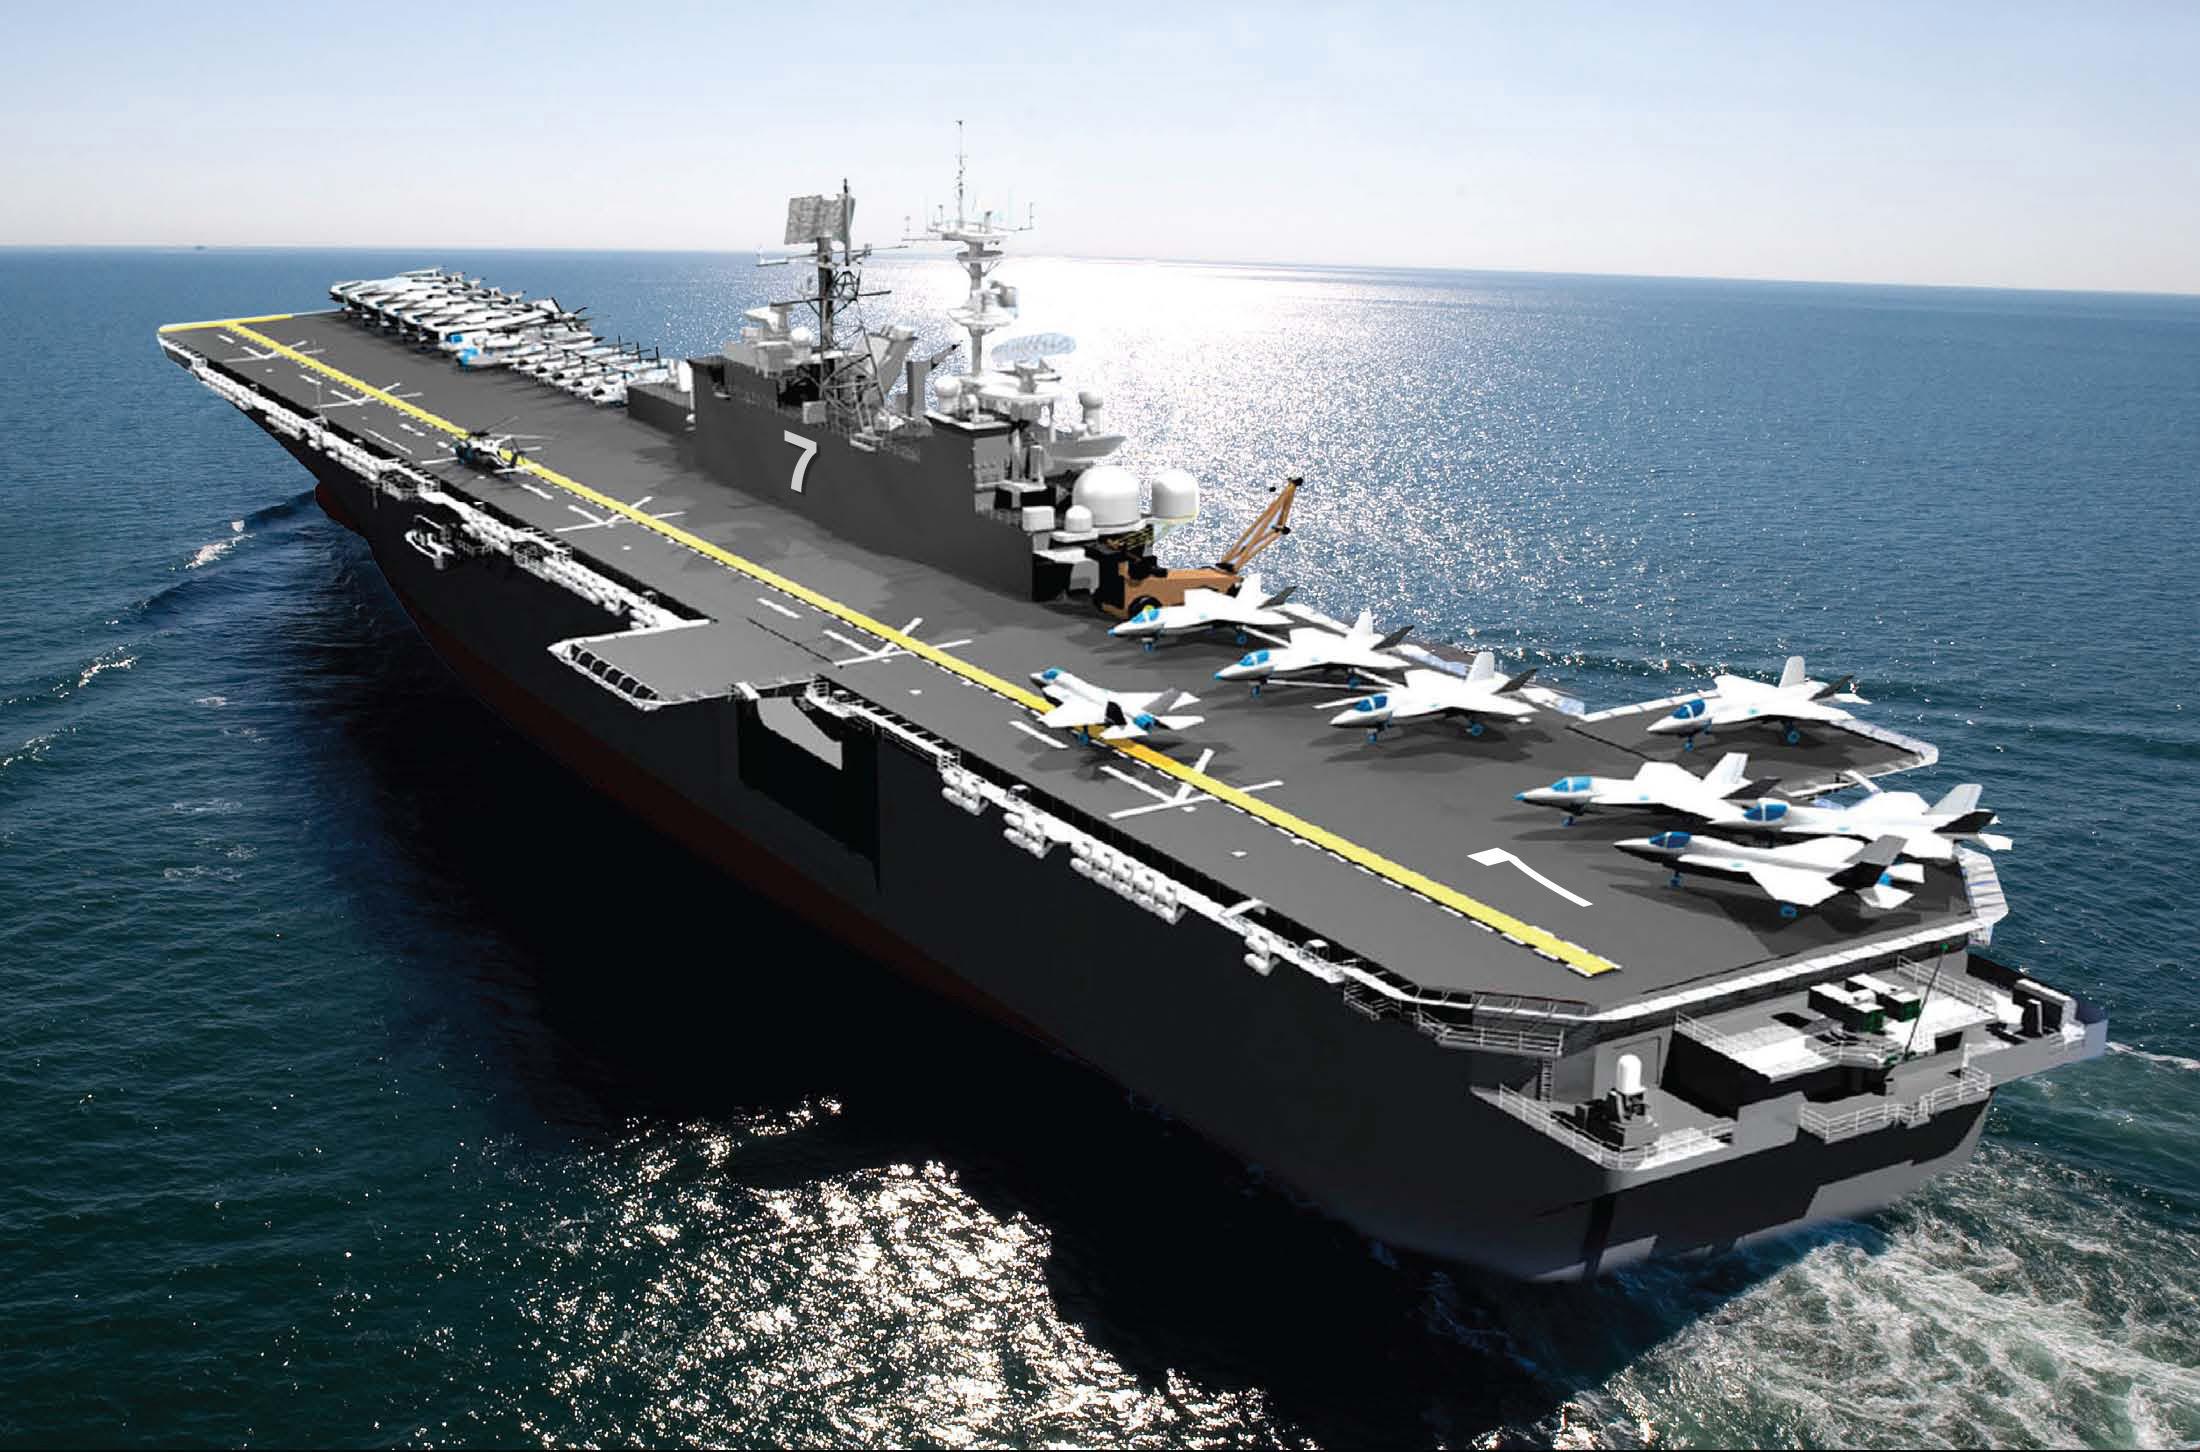 Pensacola Prepares To Host USS Tripoli Commissioning Ceremony